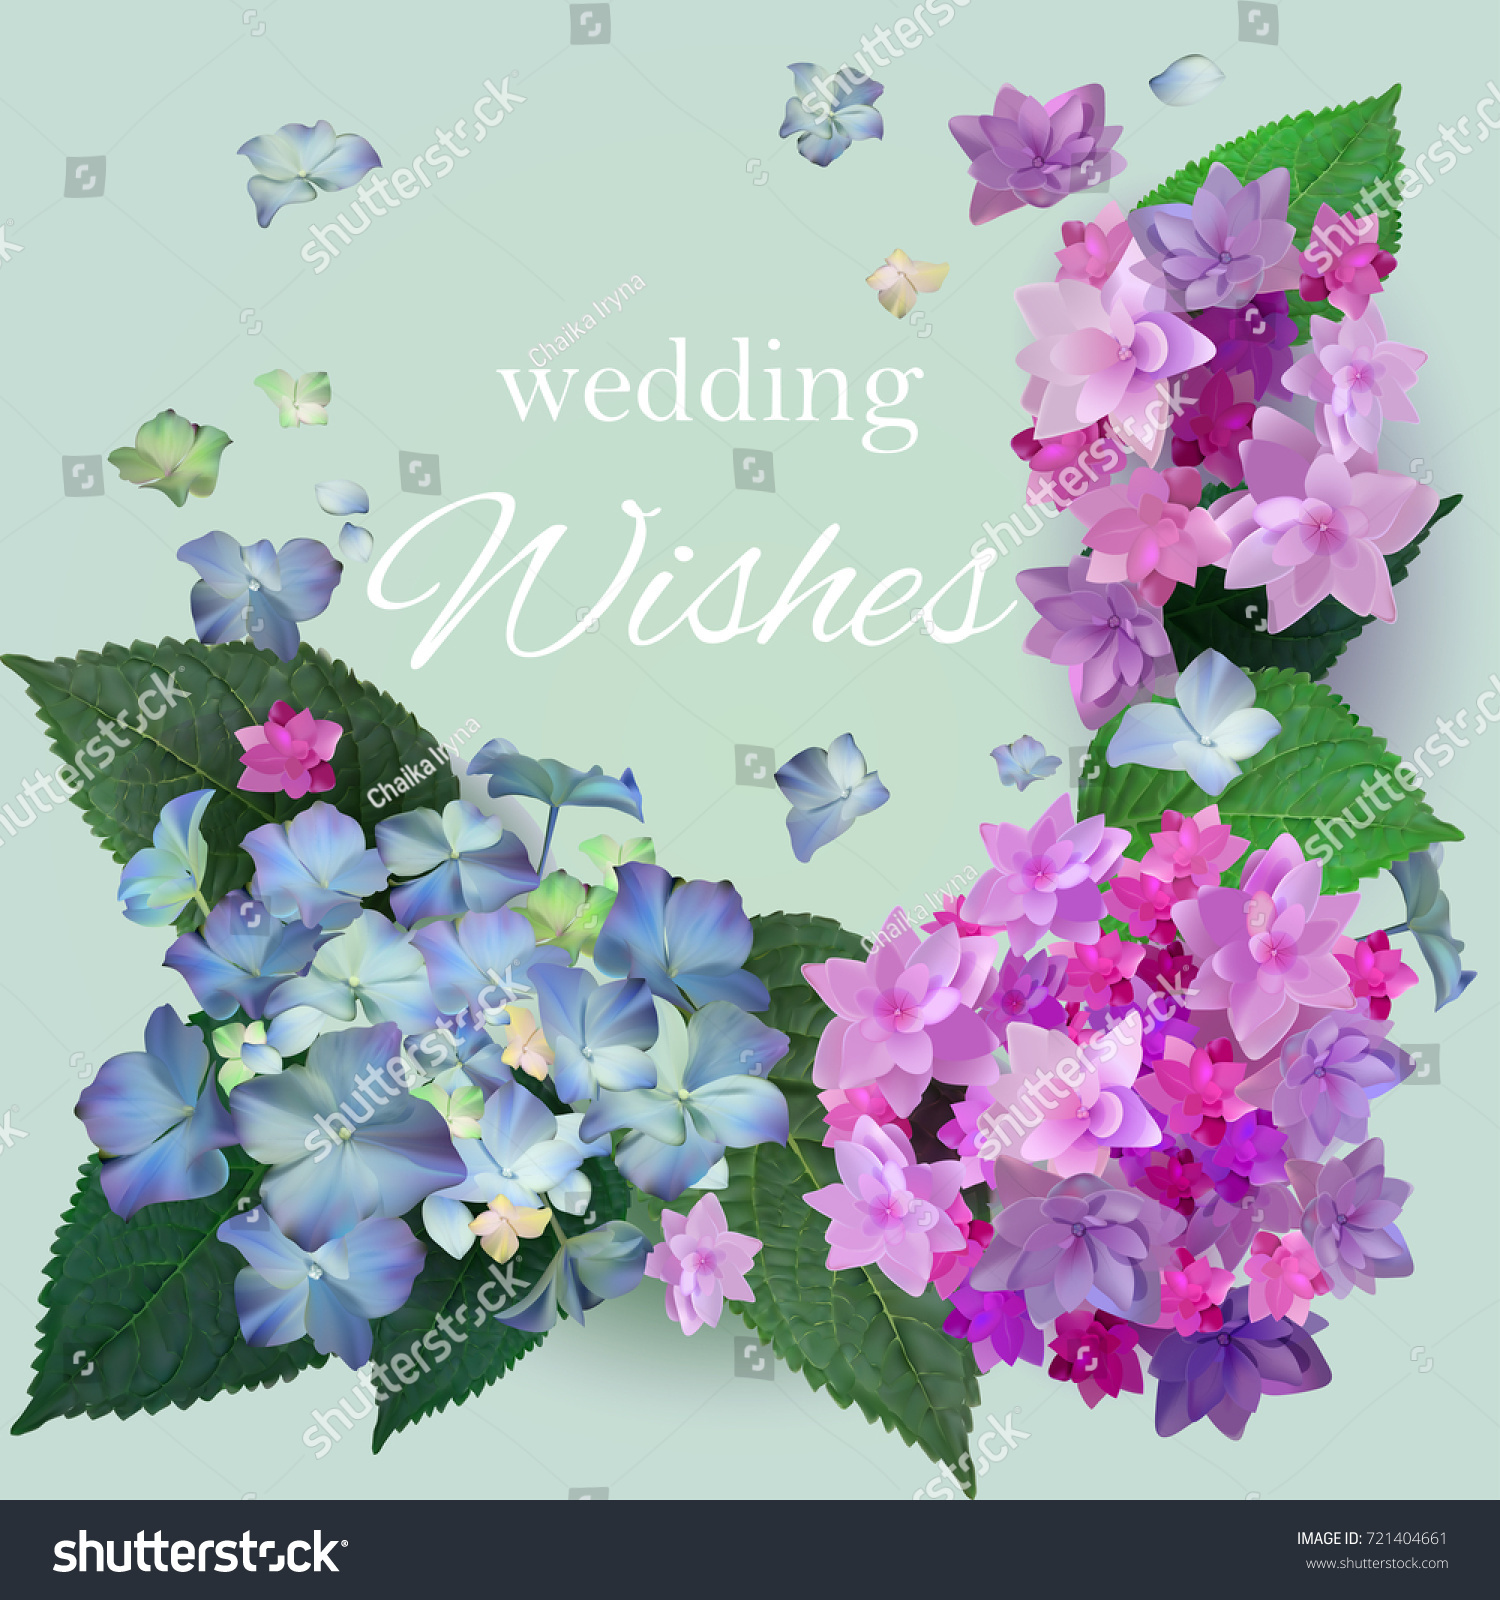 Wedding Wishesflowers Wedding Greeting Cardsblue Pink Stock Vector